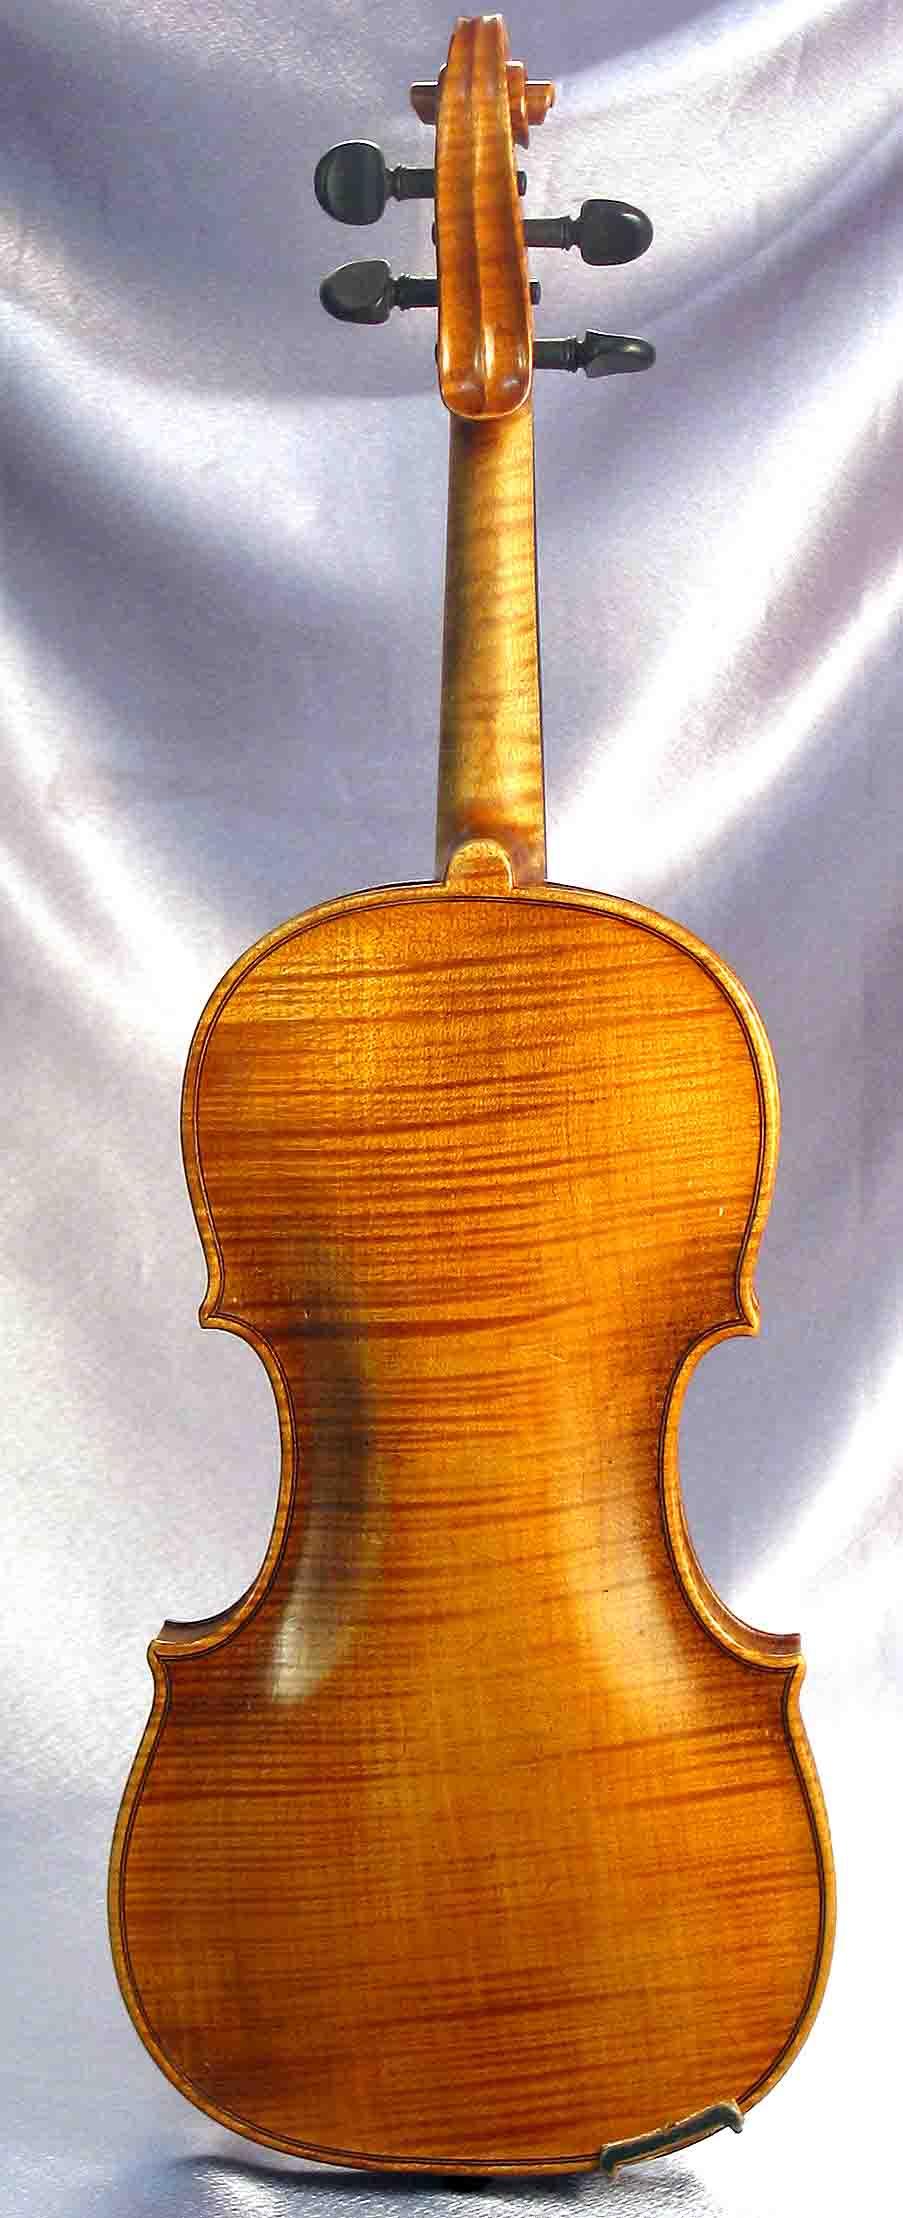 Скрипка Otto J. Klier продаётся дорого